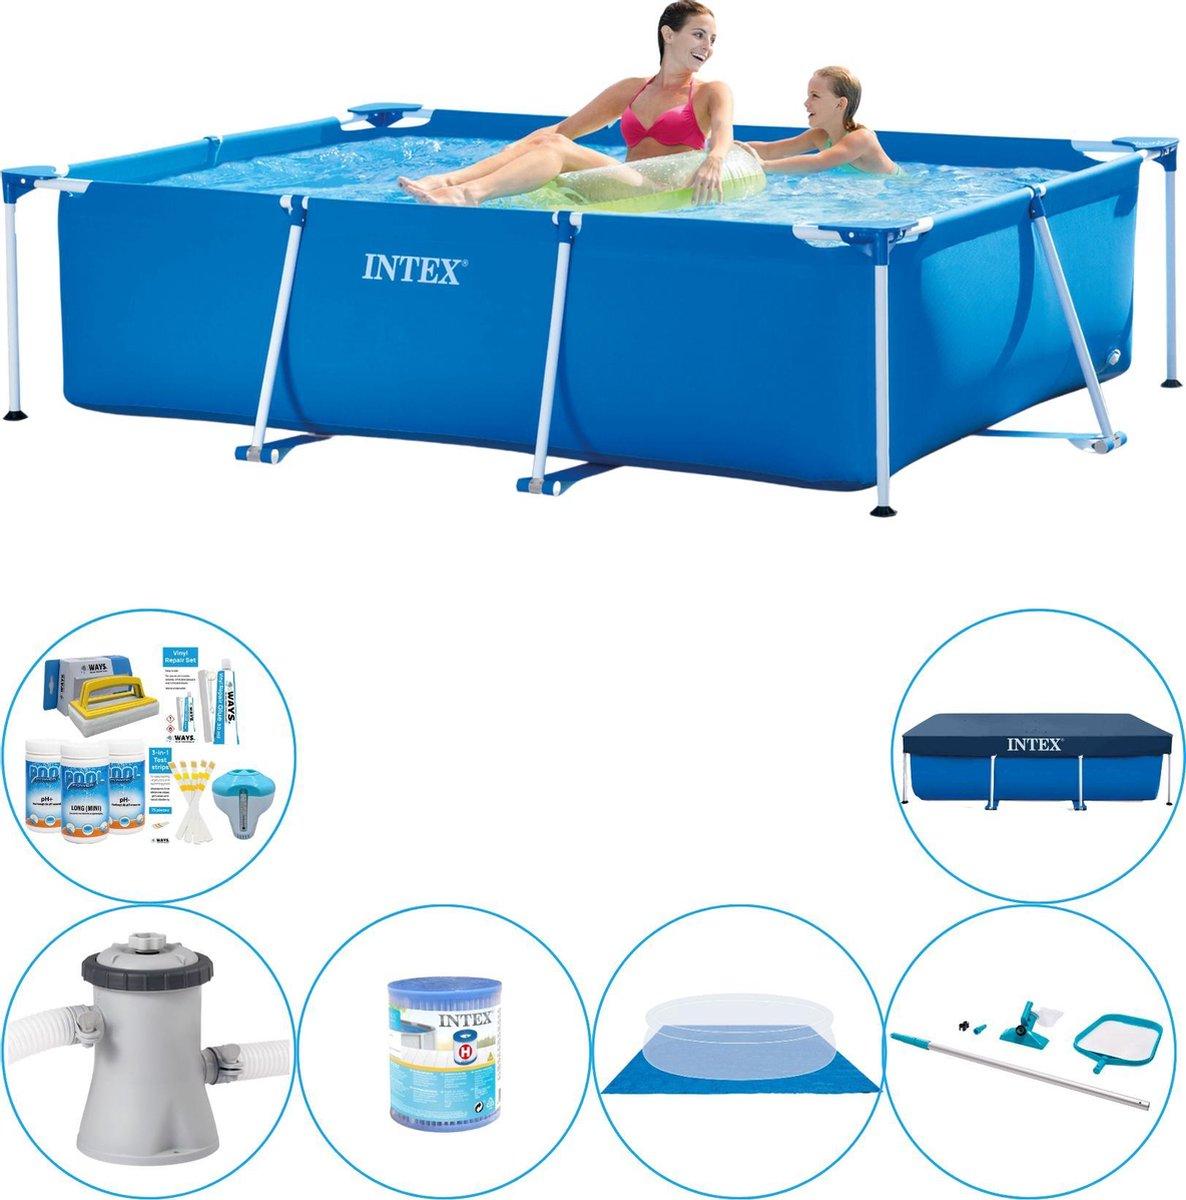 Intex Frame Pool Zwembad - 220 x 150 x 60 cm - Inclusief Accessoires